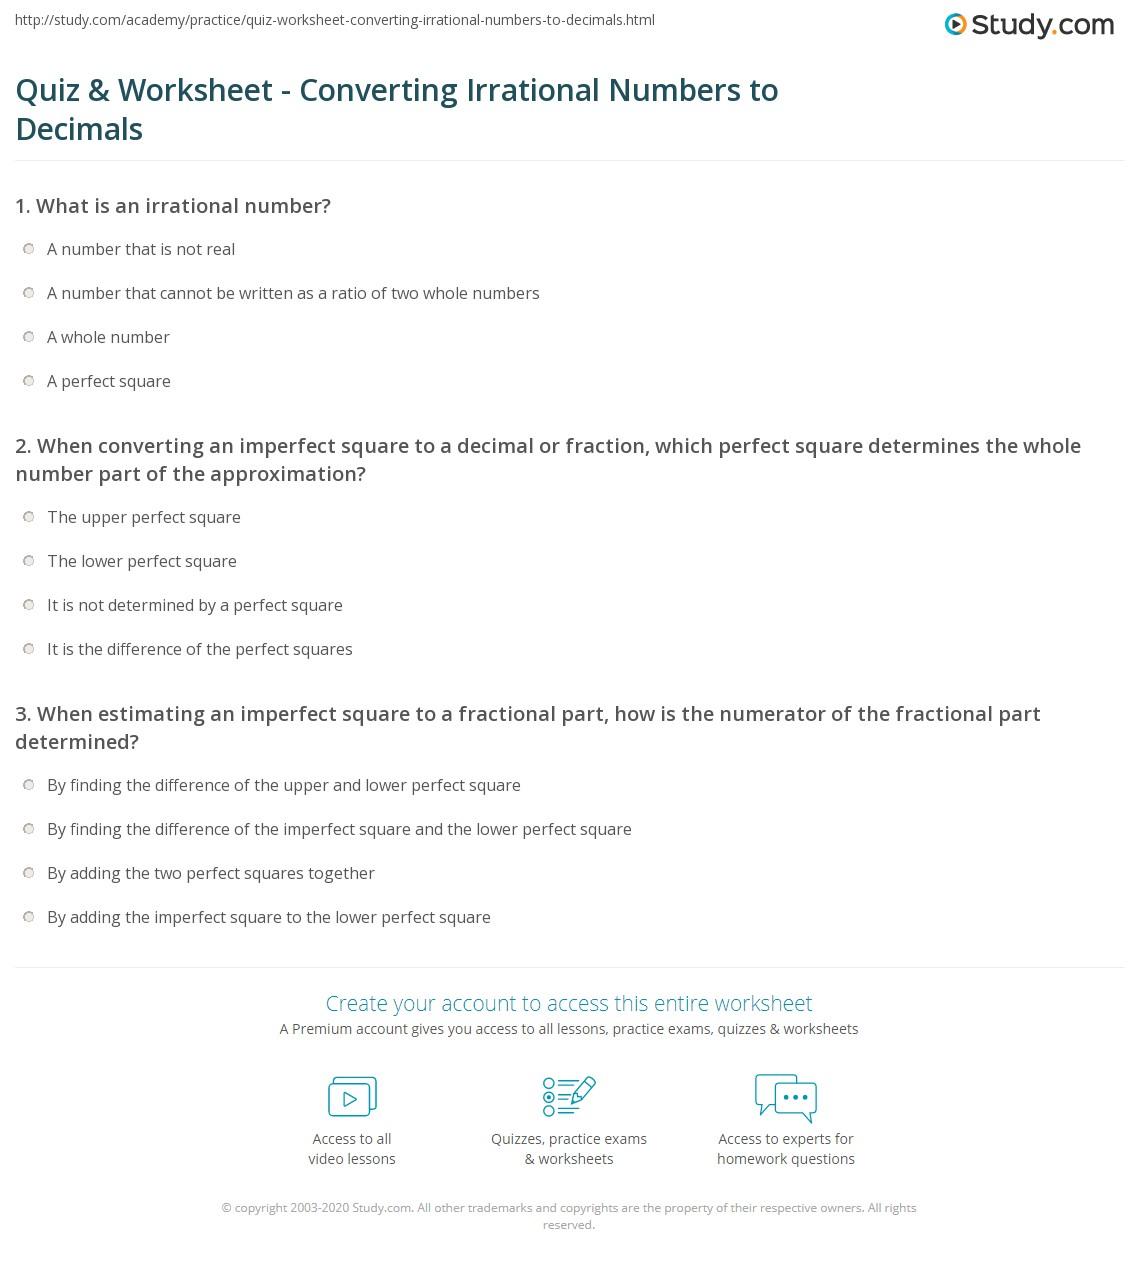 Quiz & Worksheet - Converting Irrational Numbers to Decimals   Study.com